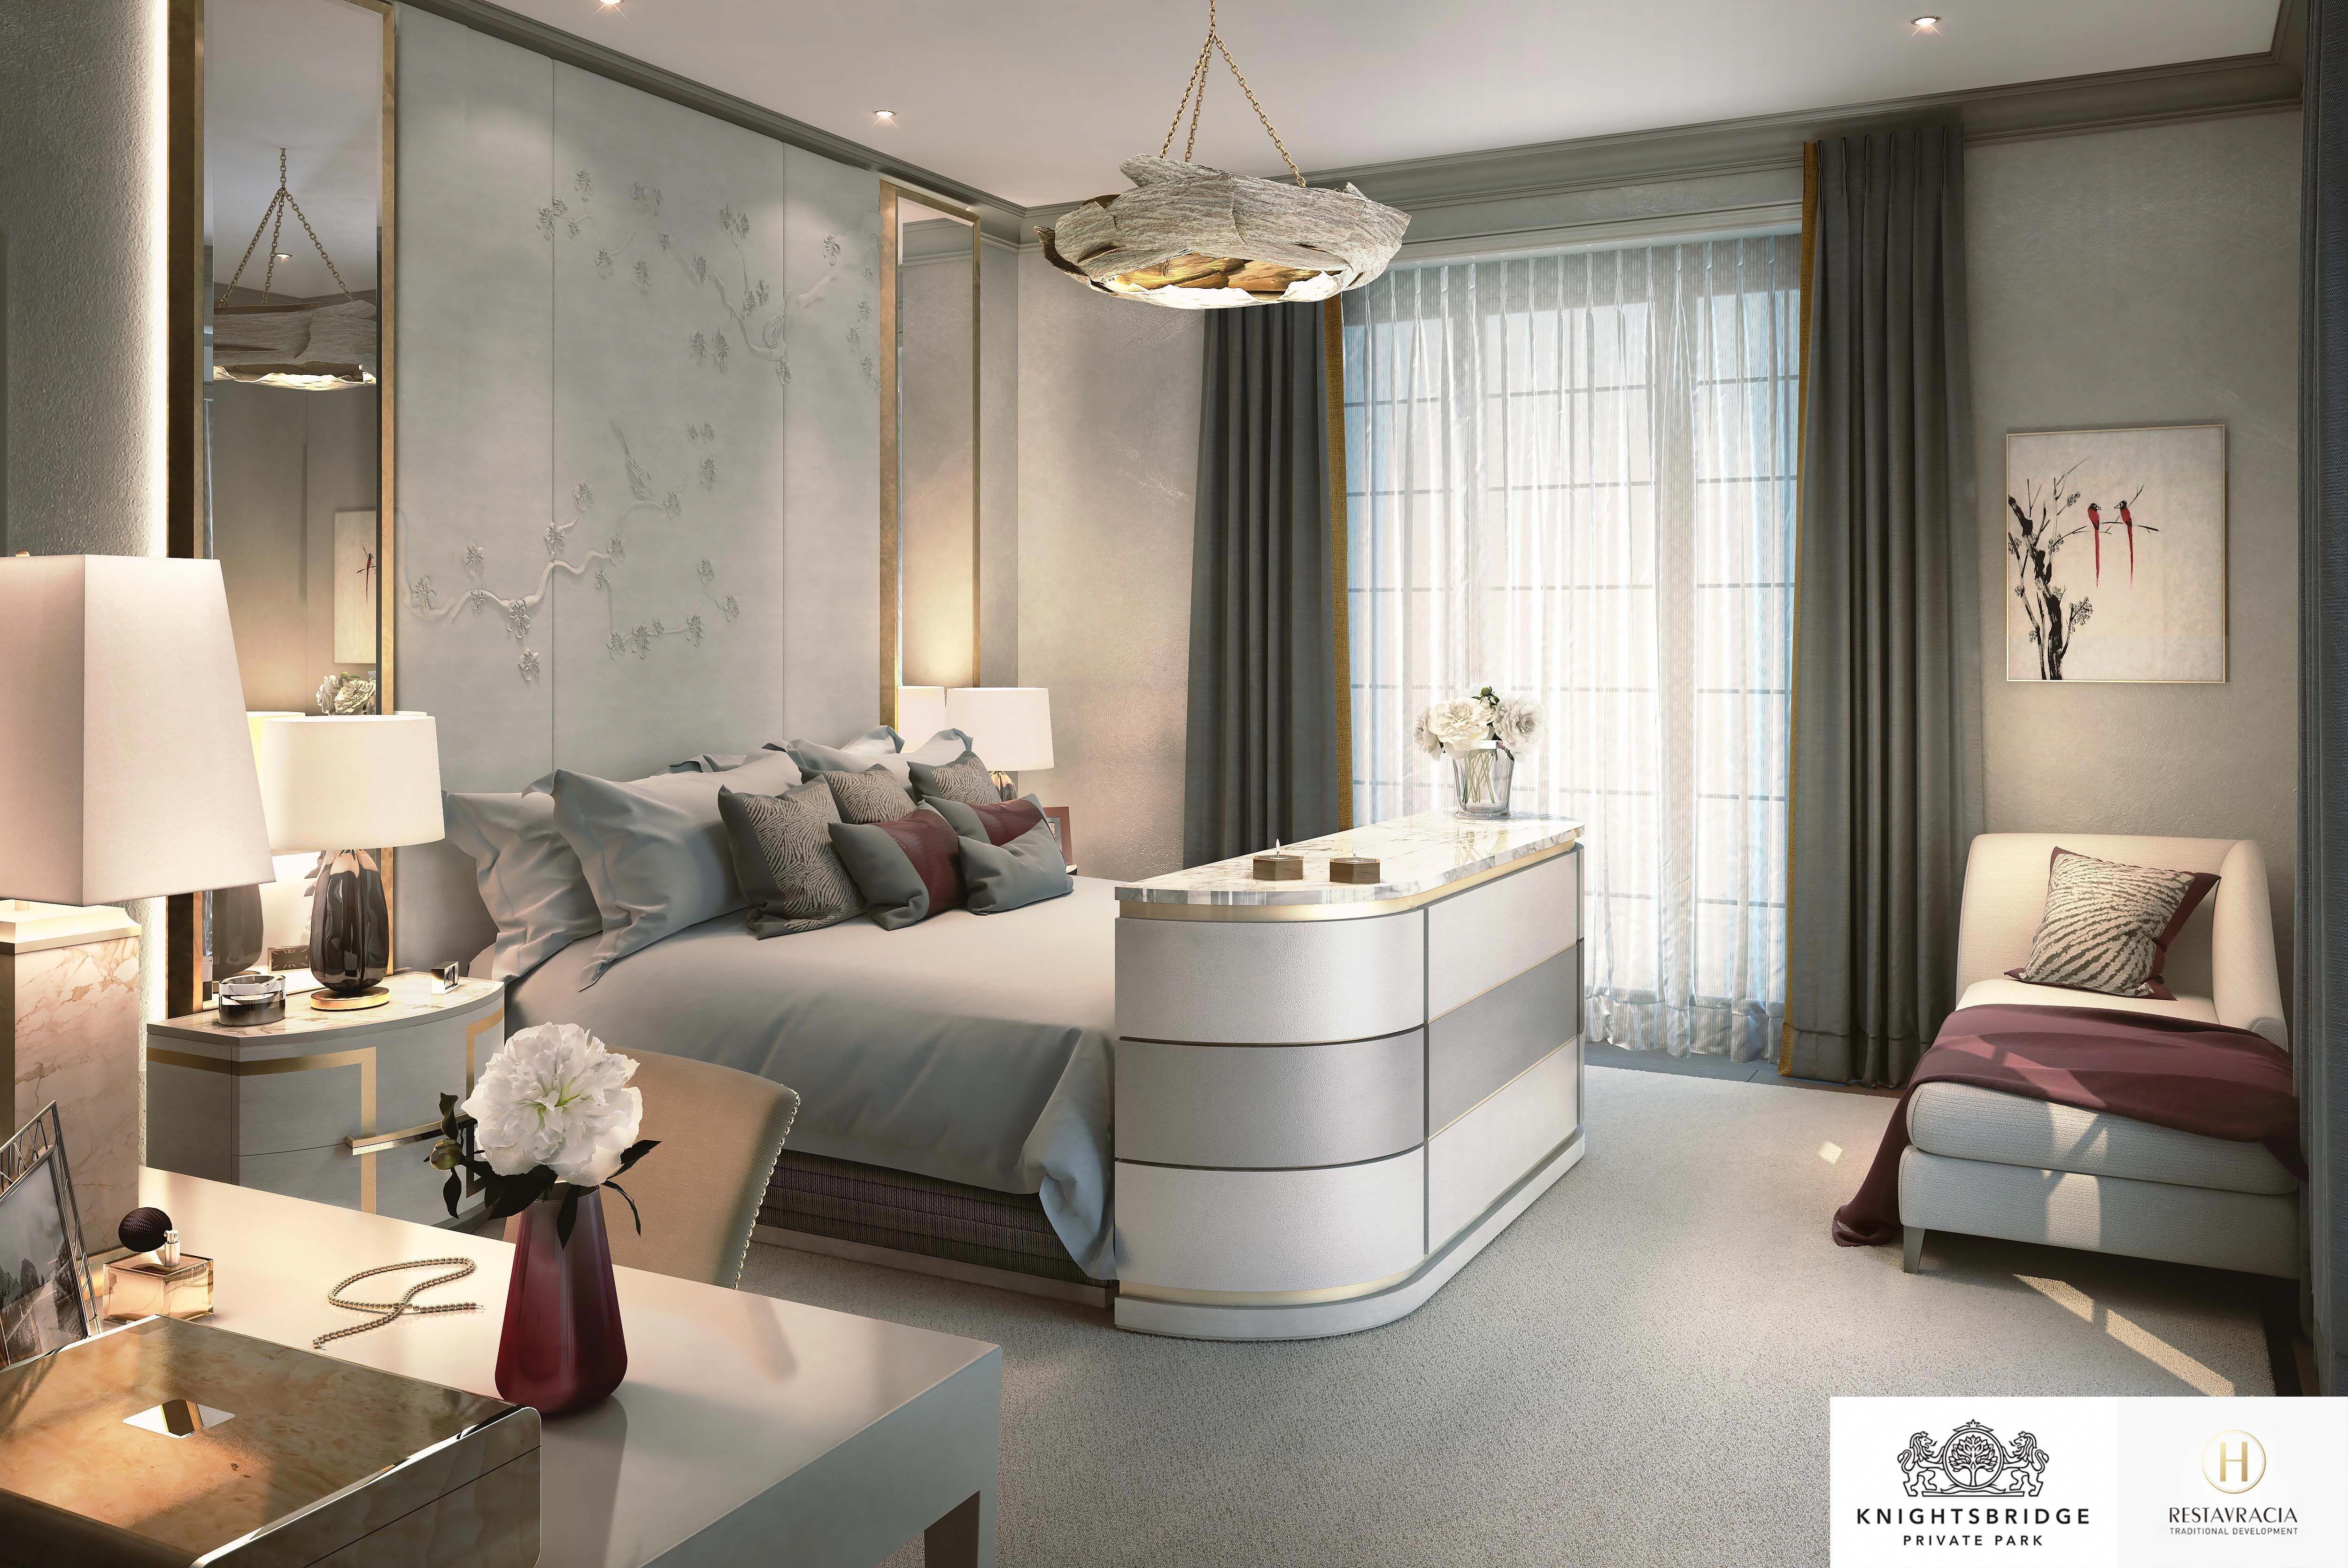 Moscow Luxury Interior Design Master Bedroom Interiordesign Home Greyluxurybedroom Ho Modern Luxury Bedroom Luxurious Bedrooms Master Bedroom Interior